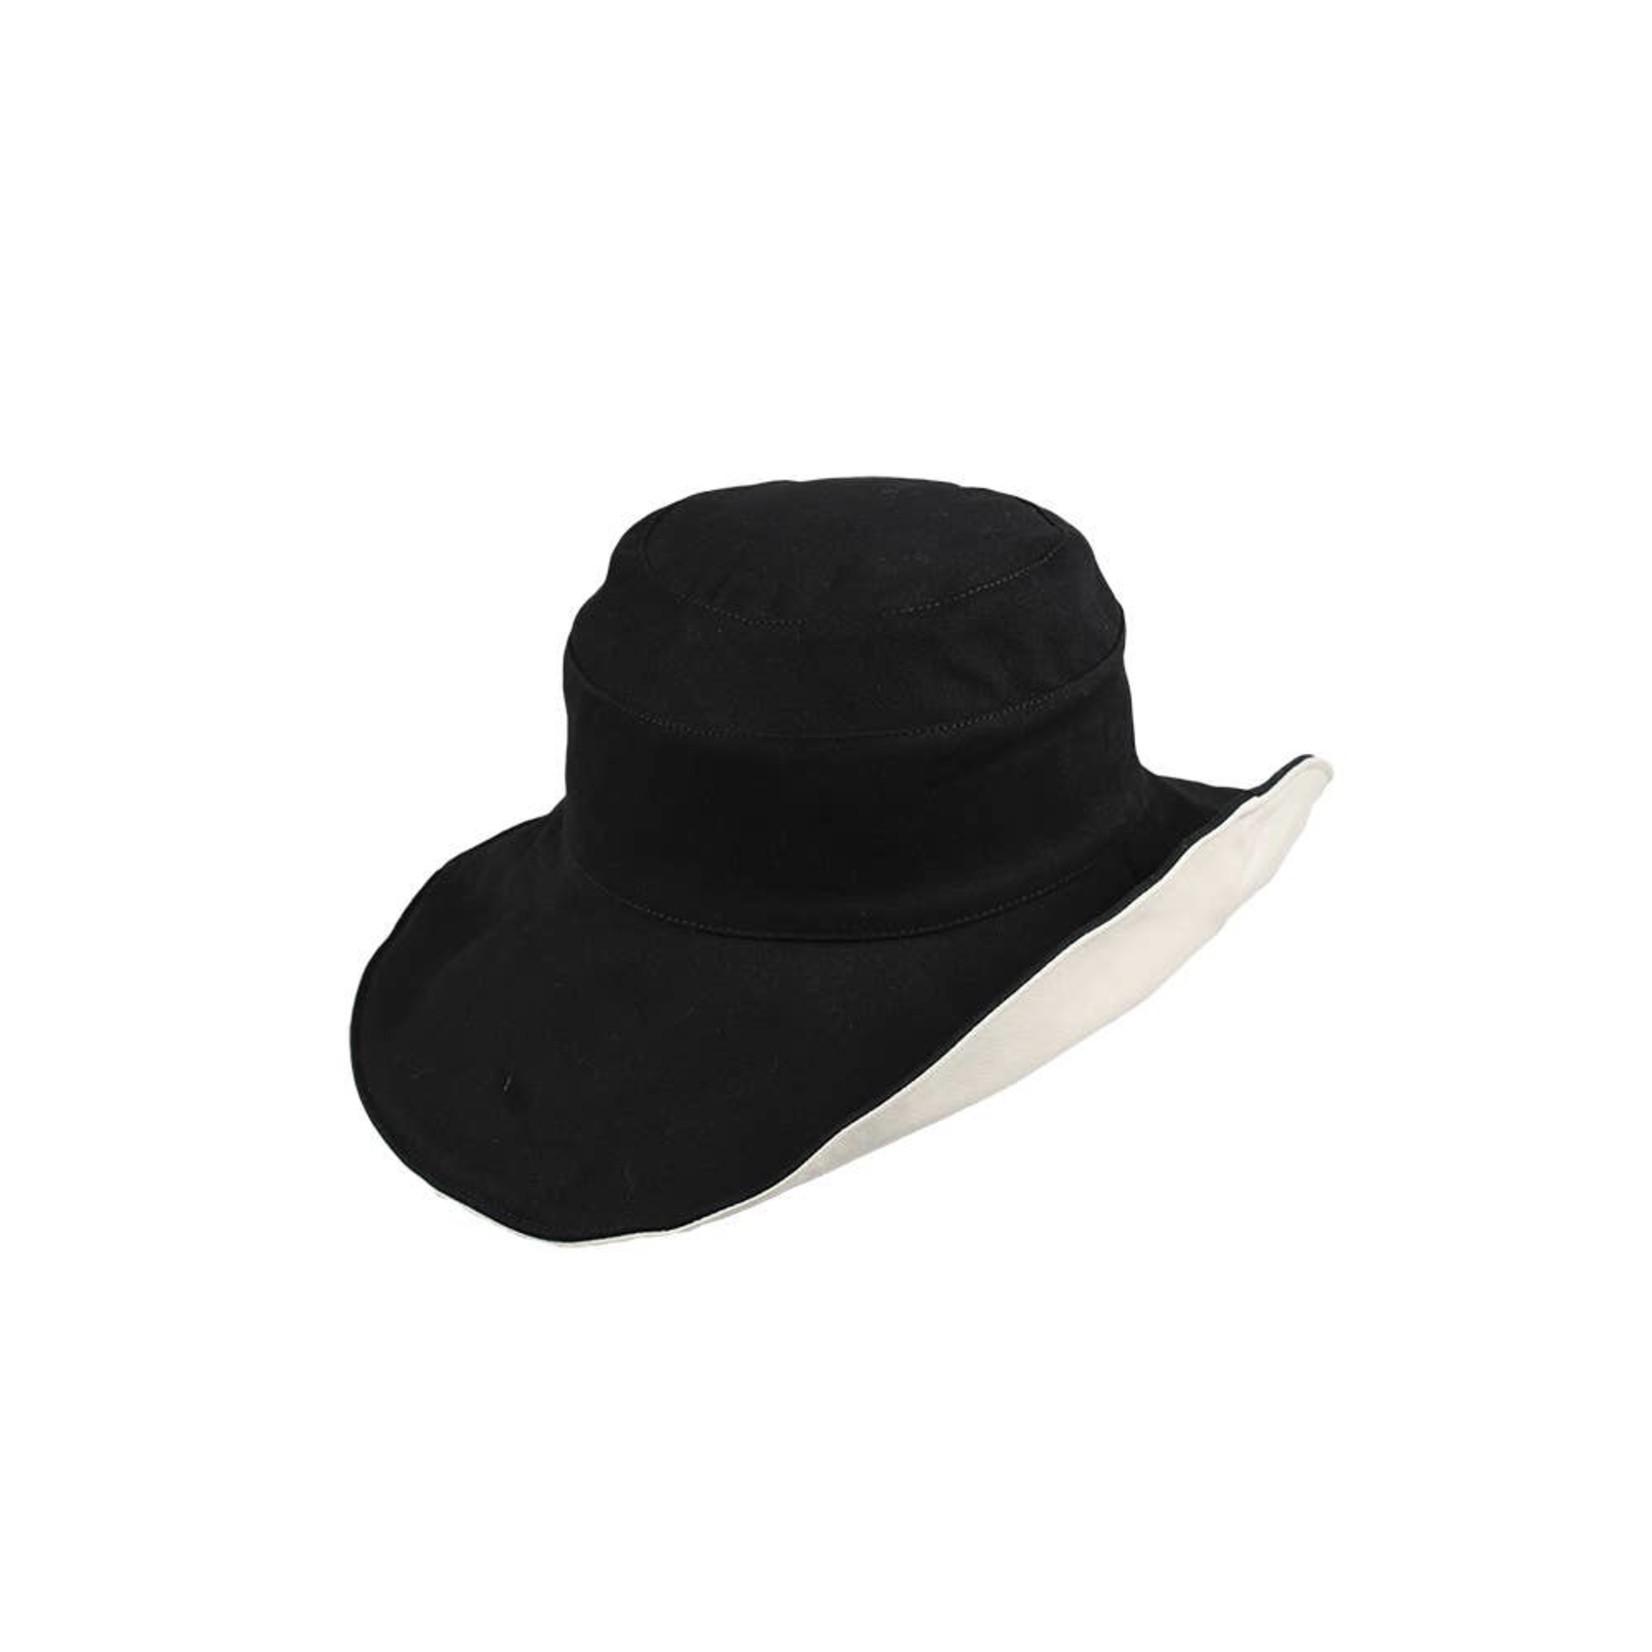 Jeanne Simmons Reversible Cloth Hat Black/Cream